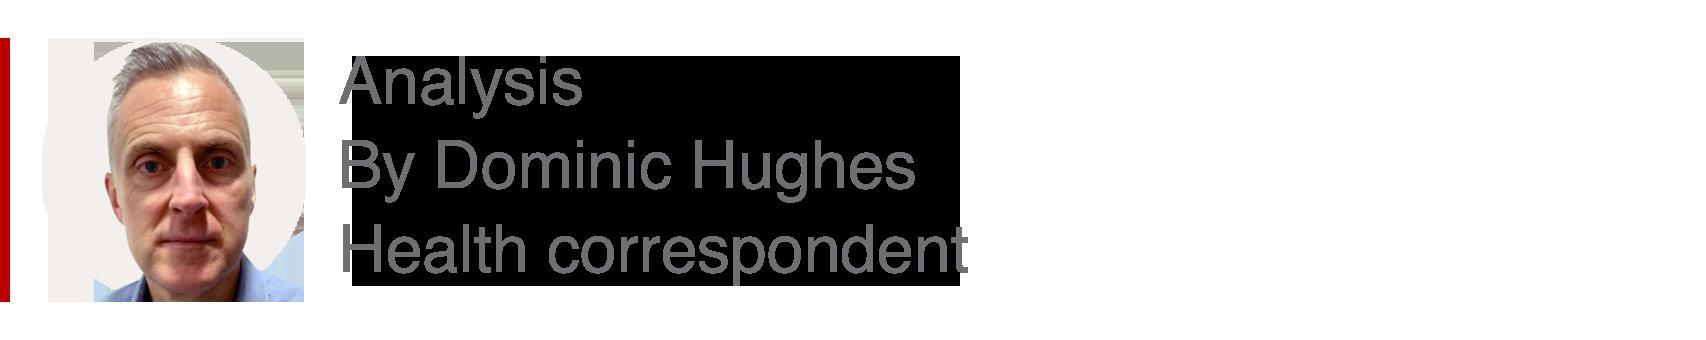 Analysis box by Dominic Hughes, health correspondent